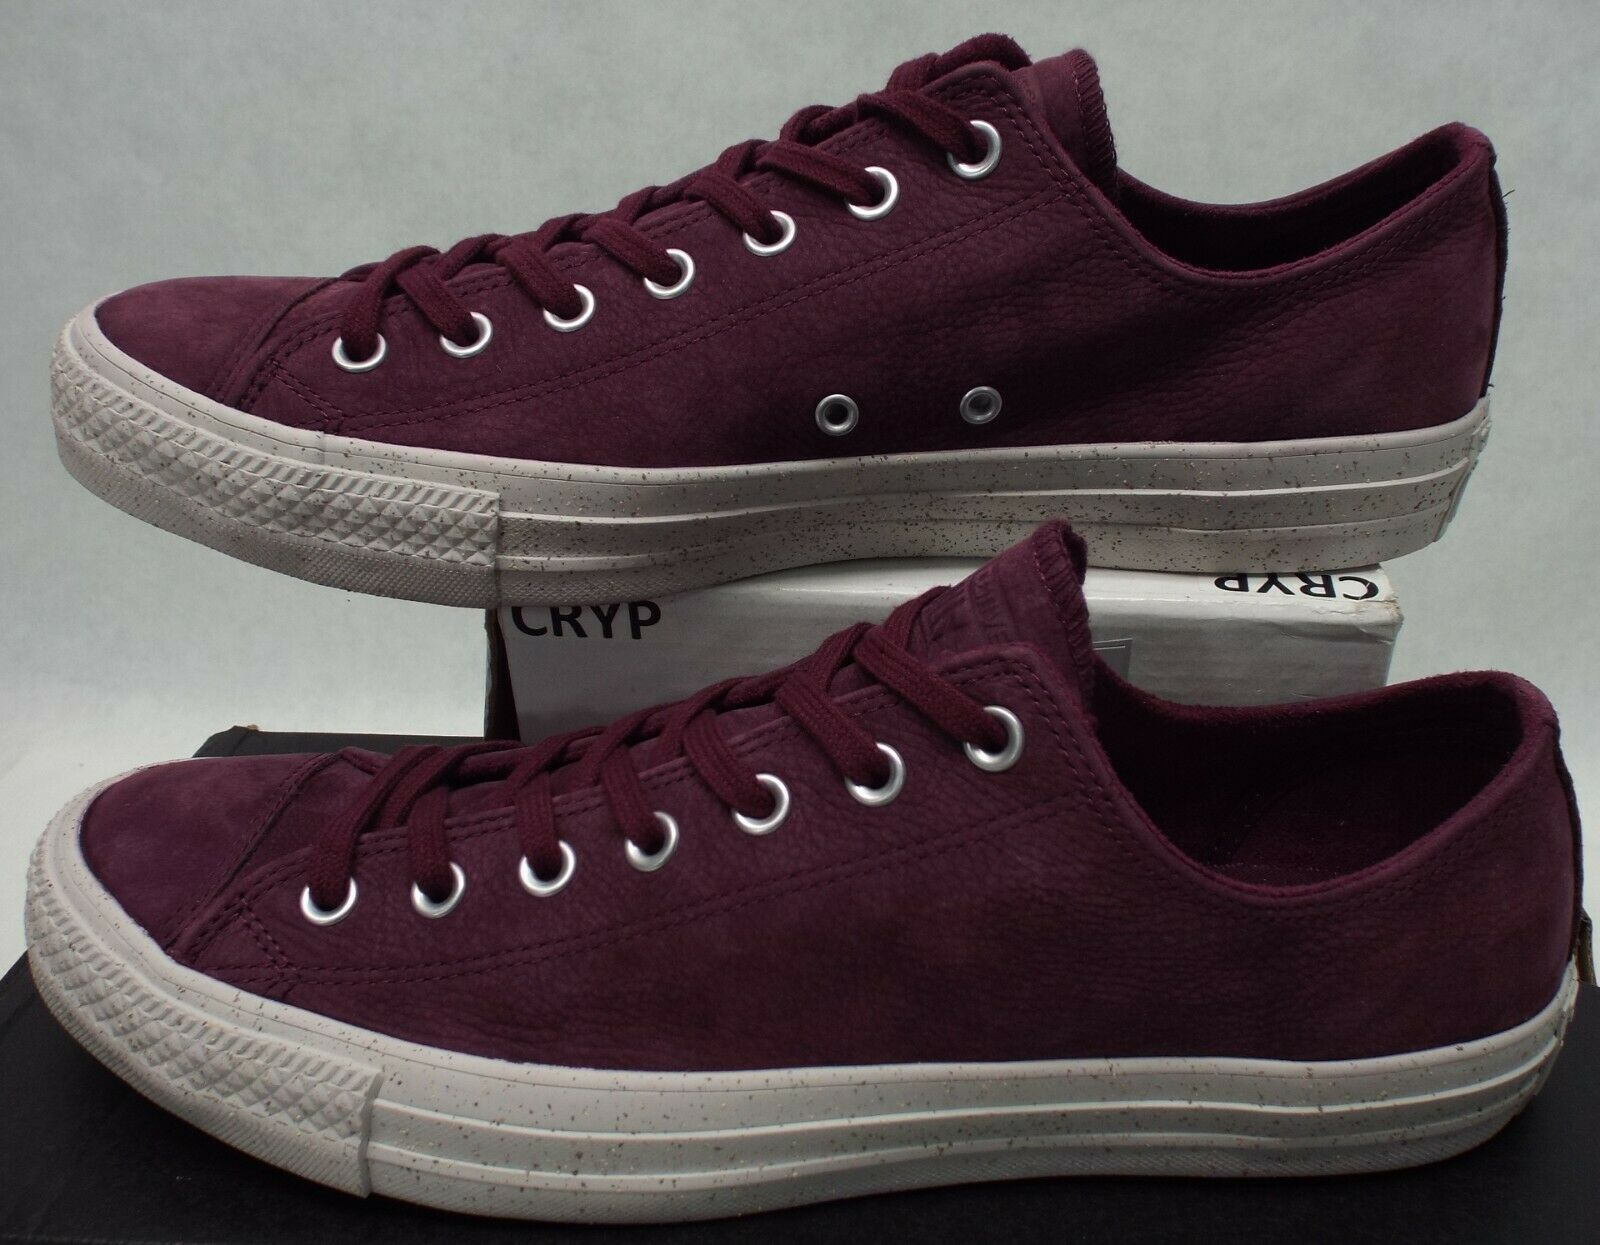 New Mens 10 Converse Chuck Taylor CTAS OX Dark Sangria Leather shoes  80 159186C